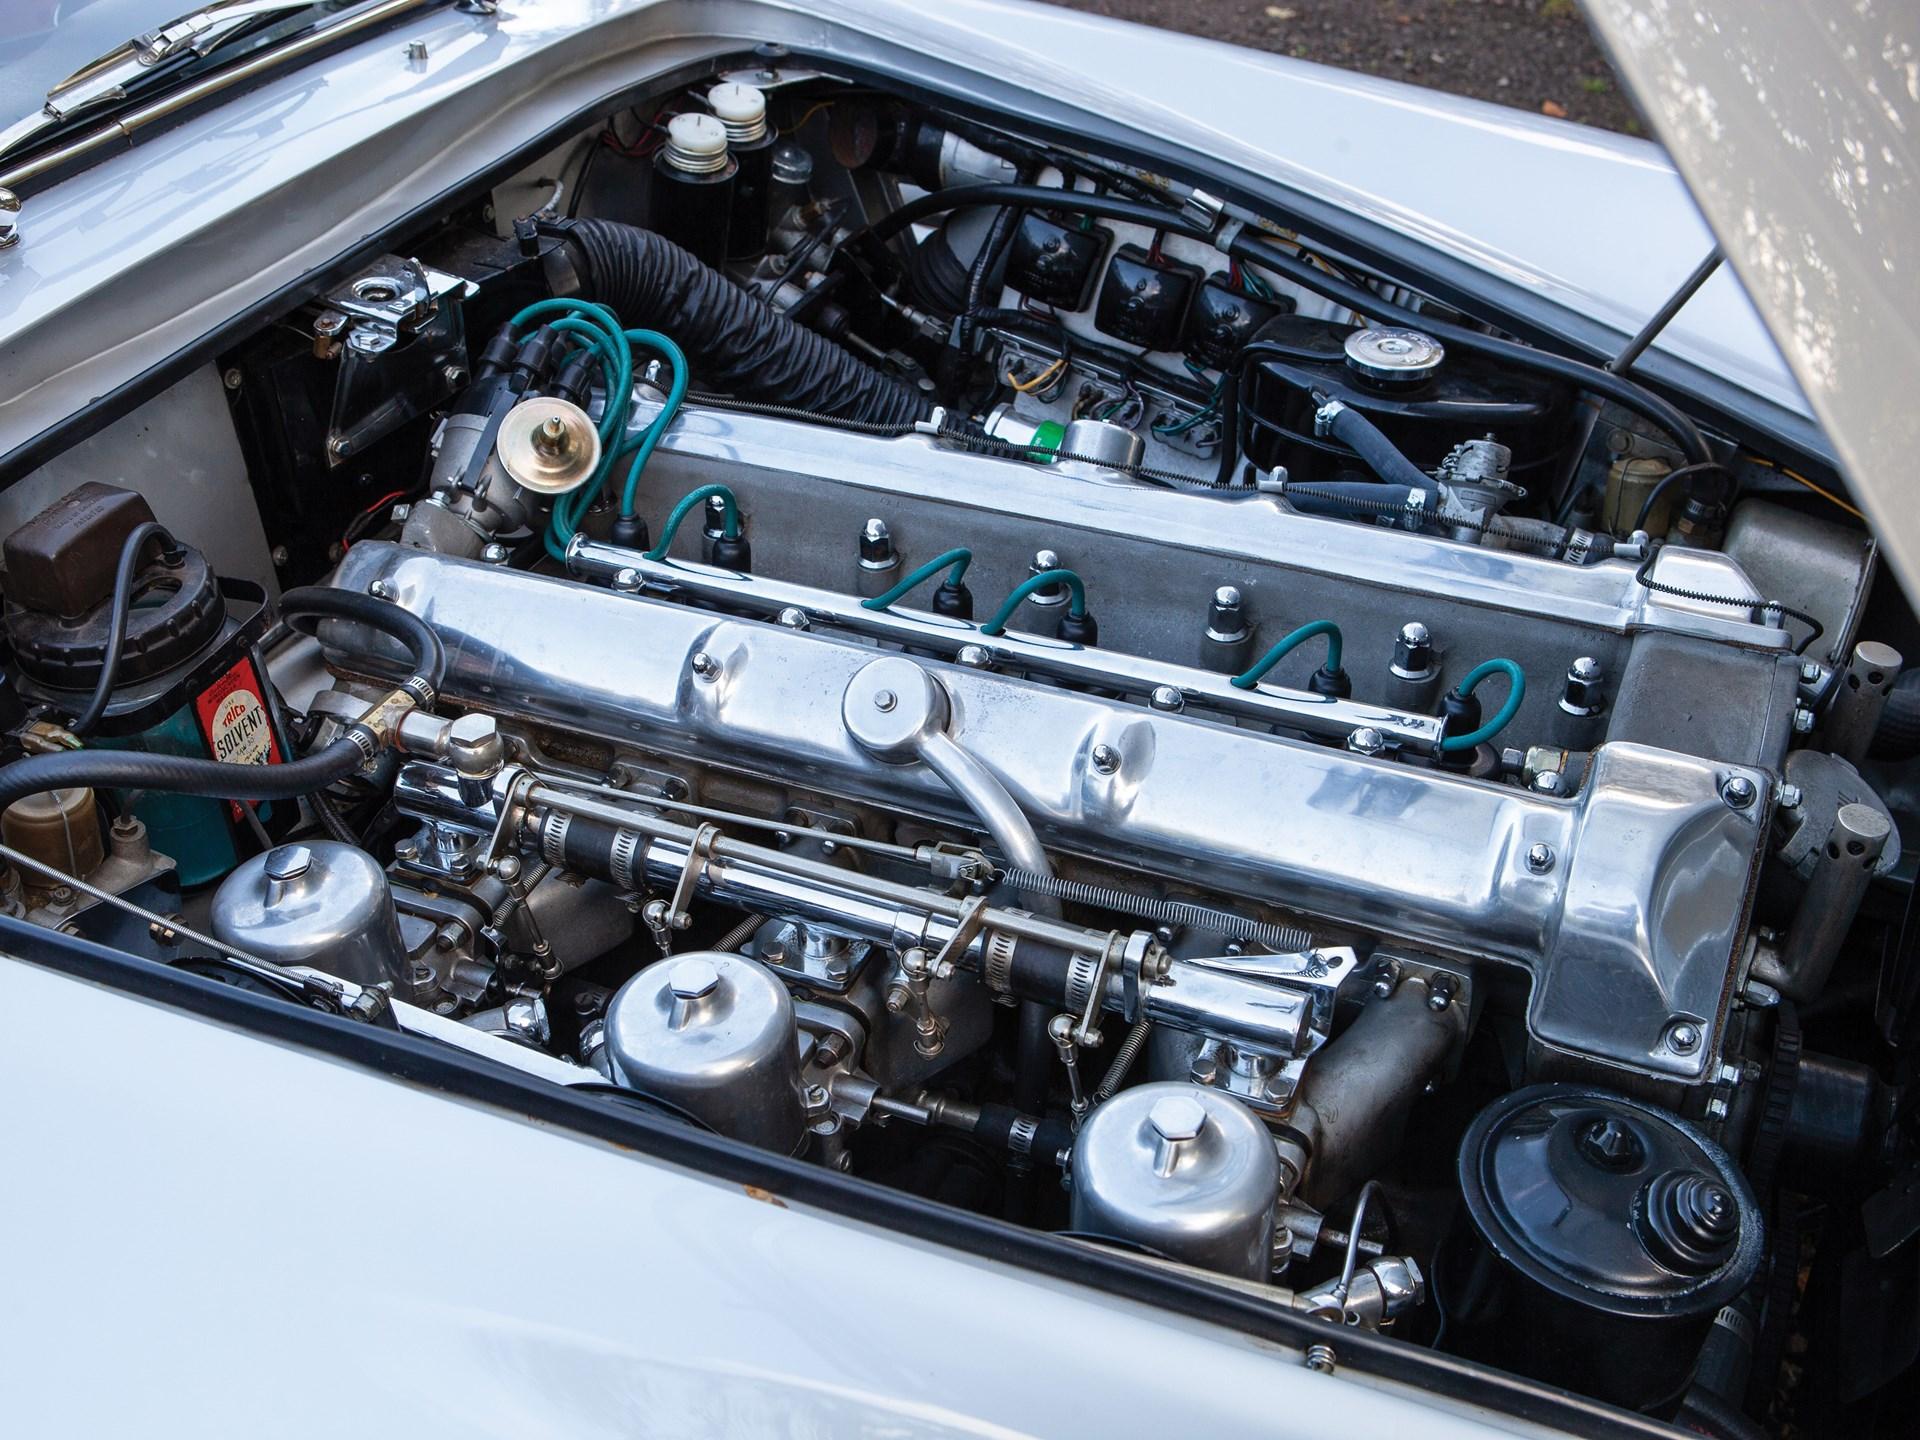 1962 Aston Martin Lagonda Rapide engine